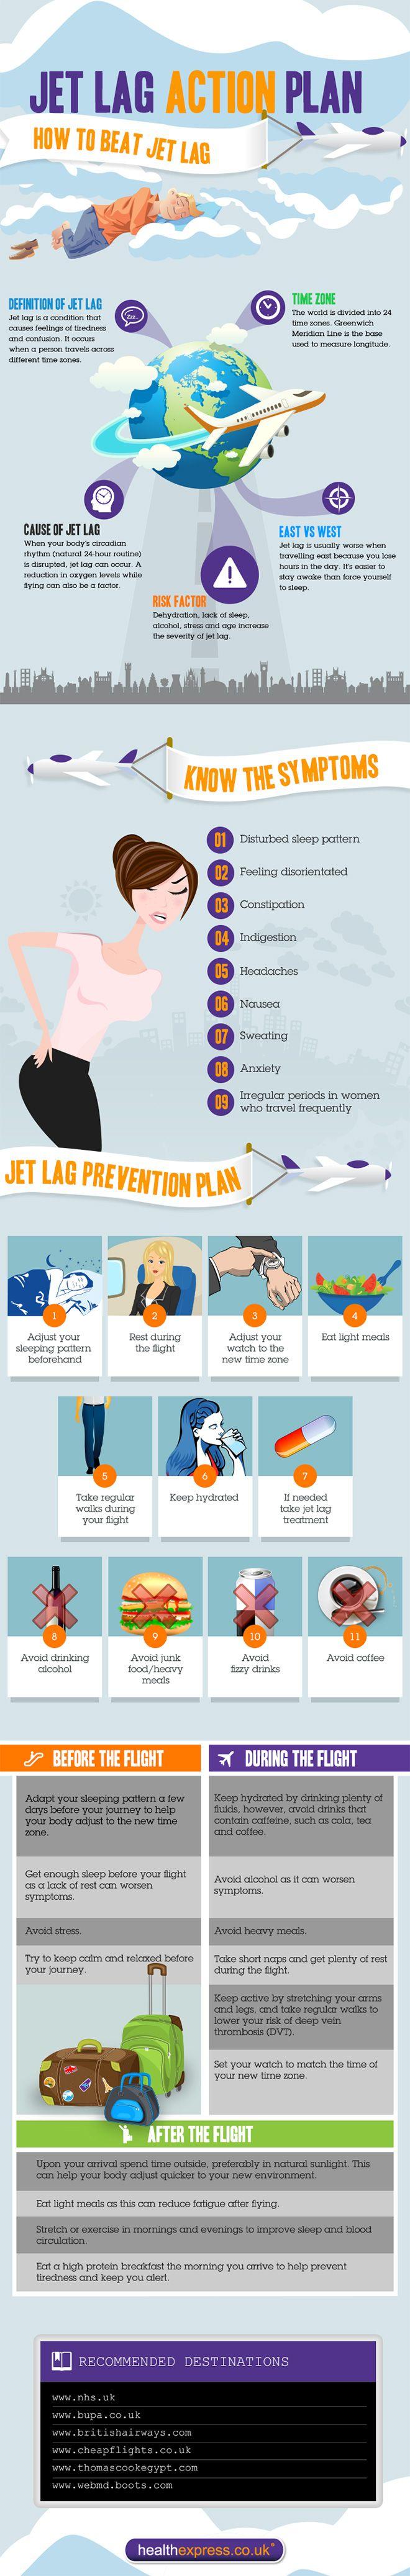 Jet Lag Action Plan – How To Beat Jet Lag